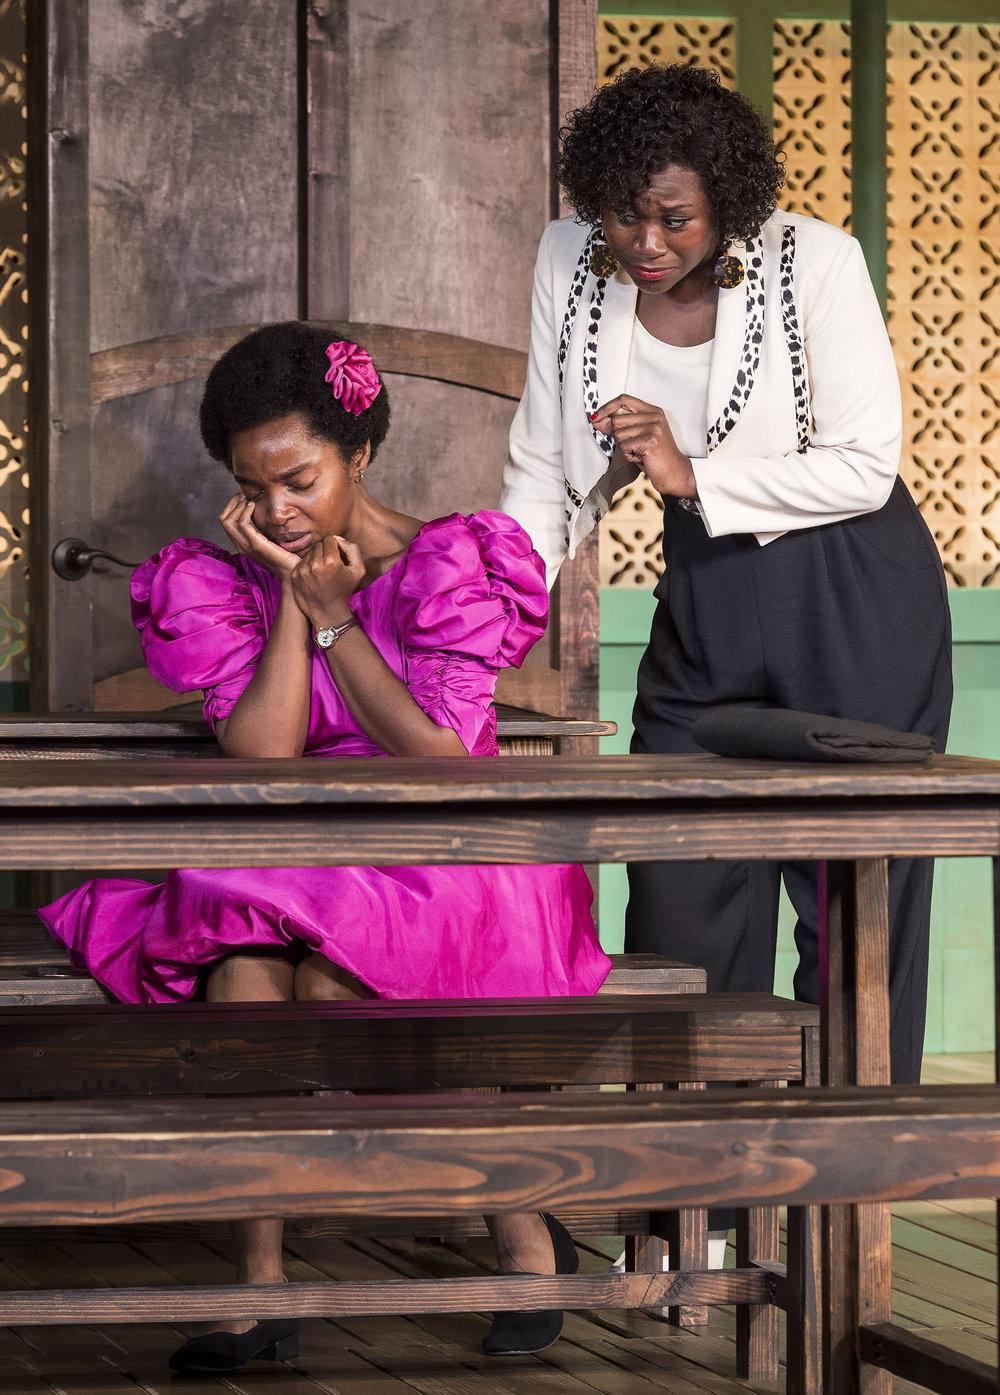 WEB-311.MaameYaa-Boafo-and-Zenzi-Williams-in-School-Girls-Or-the-African-Mean-Girls-Play-photo-by-Craig-Schwartz.jpg